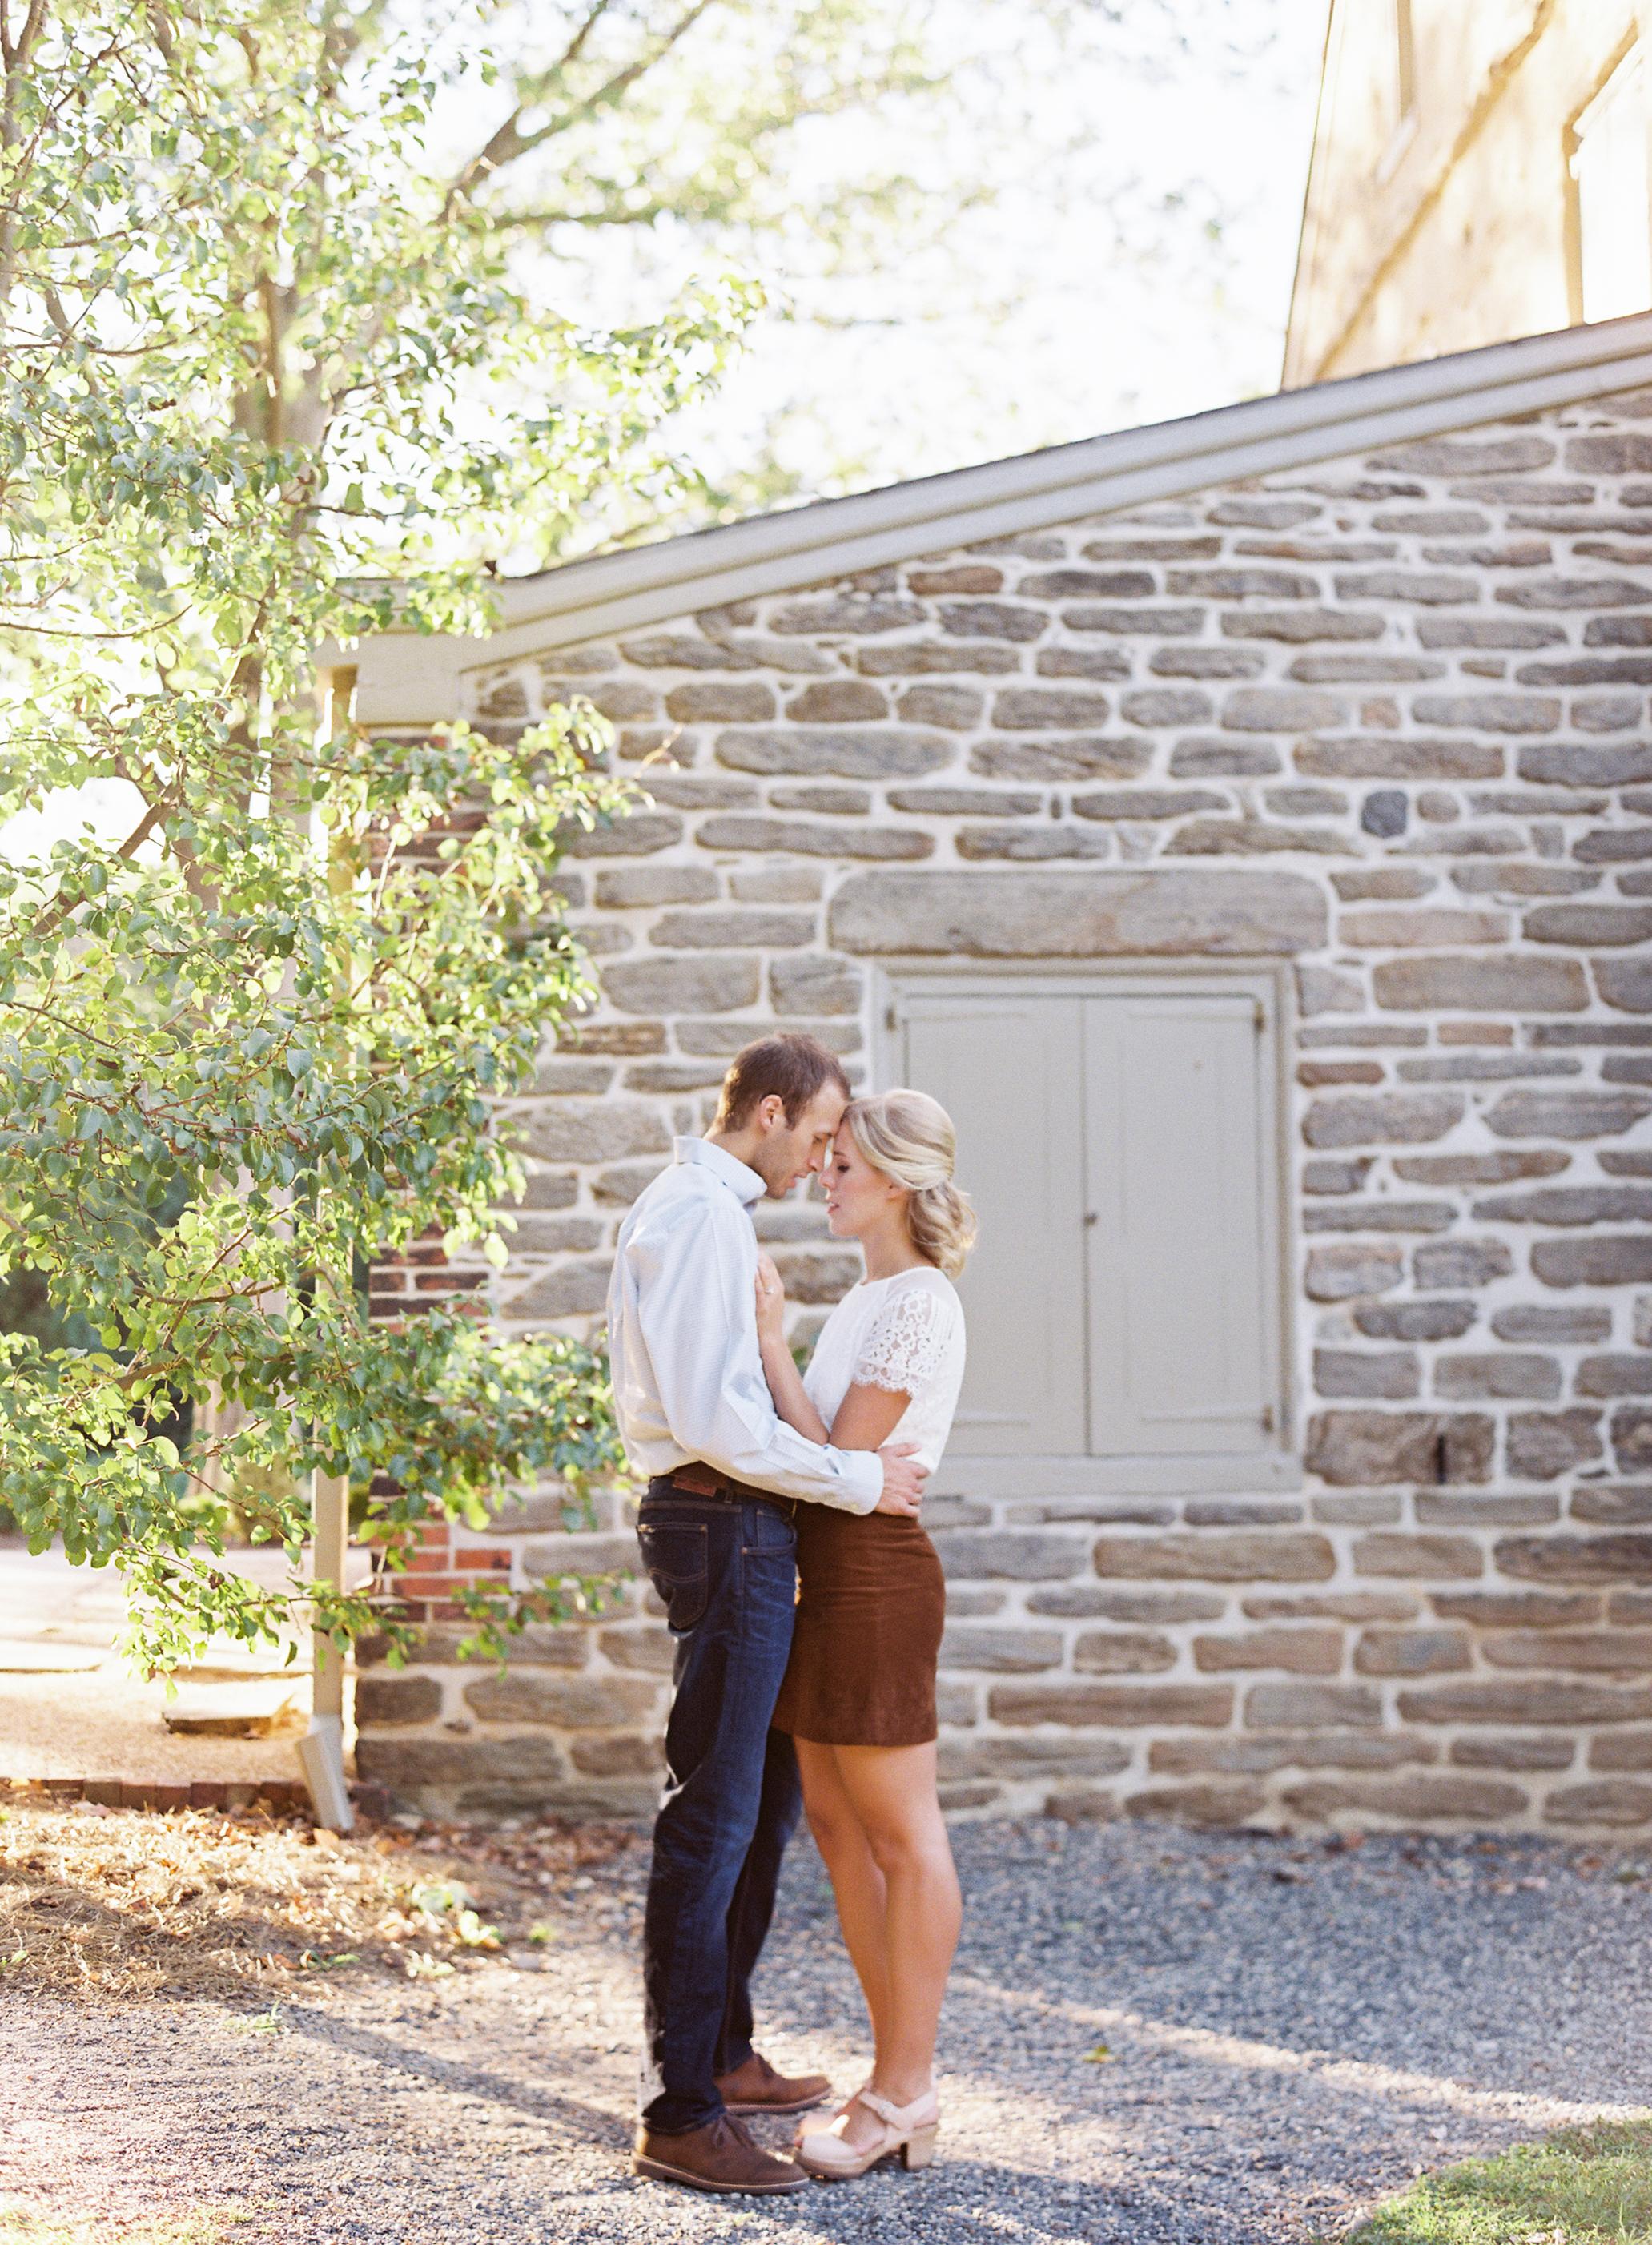 Meghan Mehan Photography | Fine Art Film Wedding Photographer | California | San Francisco | Napa | Sonoma | Santa Barbara | Big Sur | Los Angeles | Destination Wedding Photographer 026.jpg